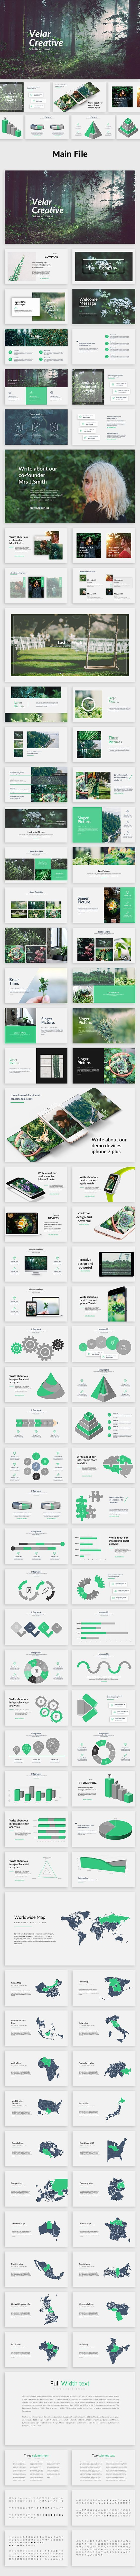 Velar - Creative Powerpoint Template